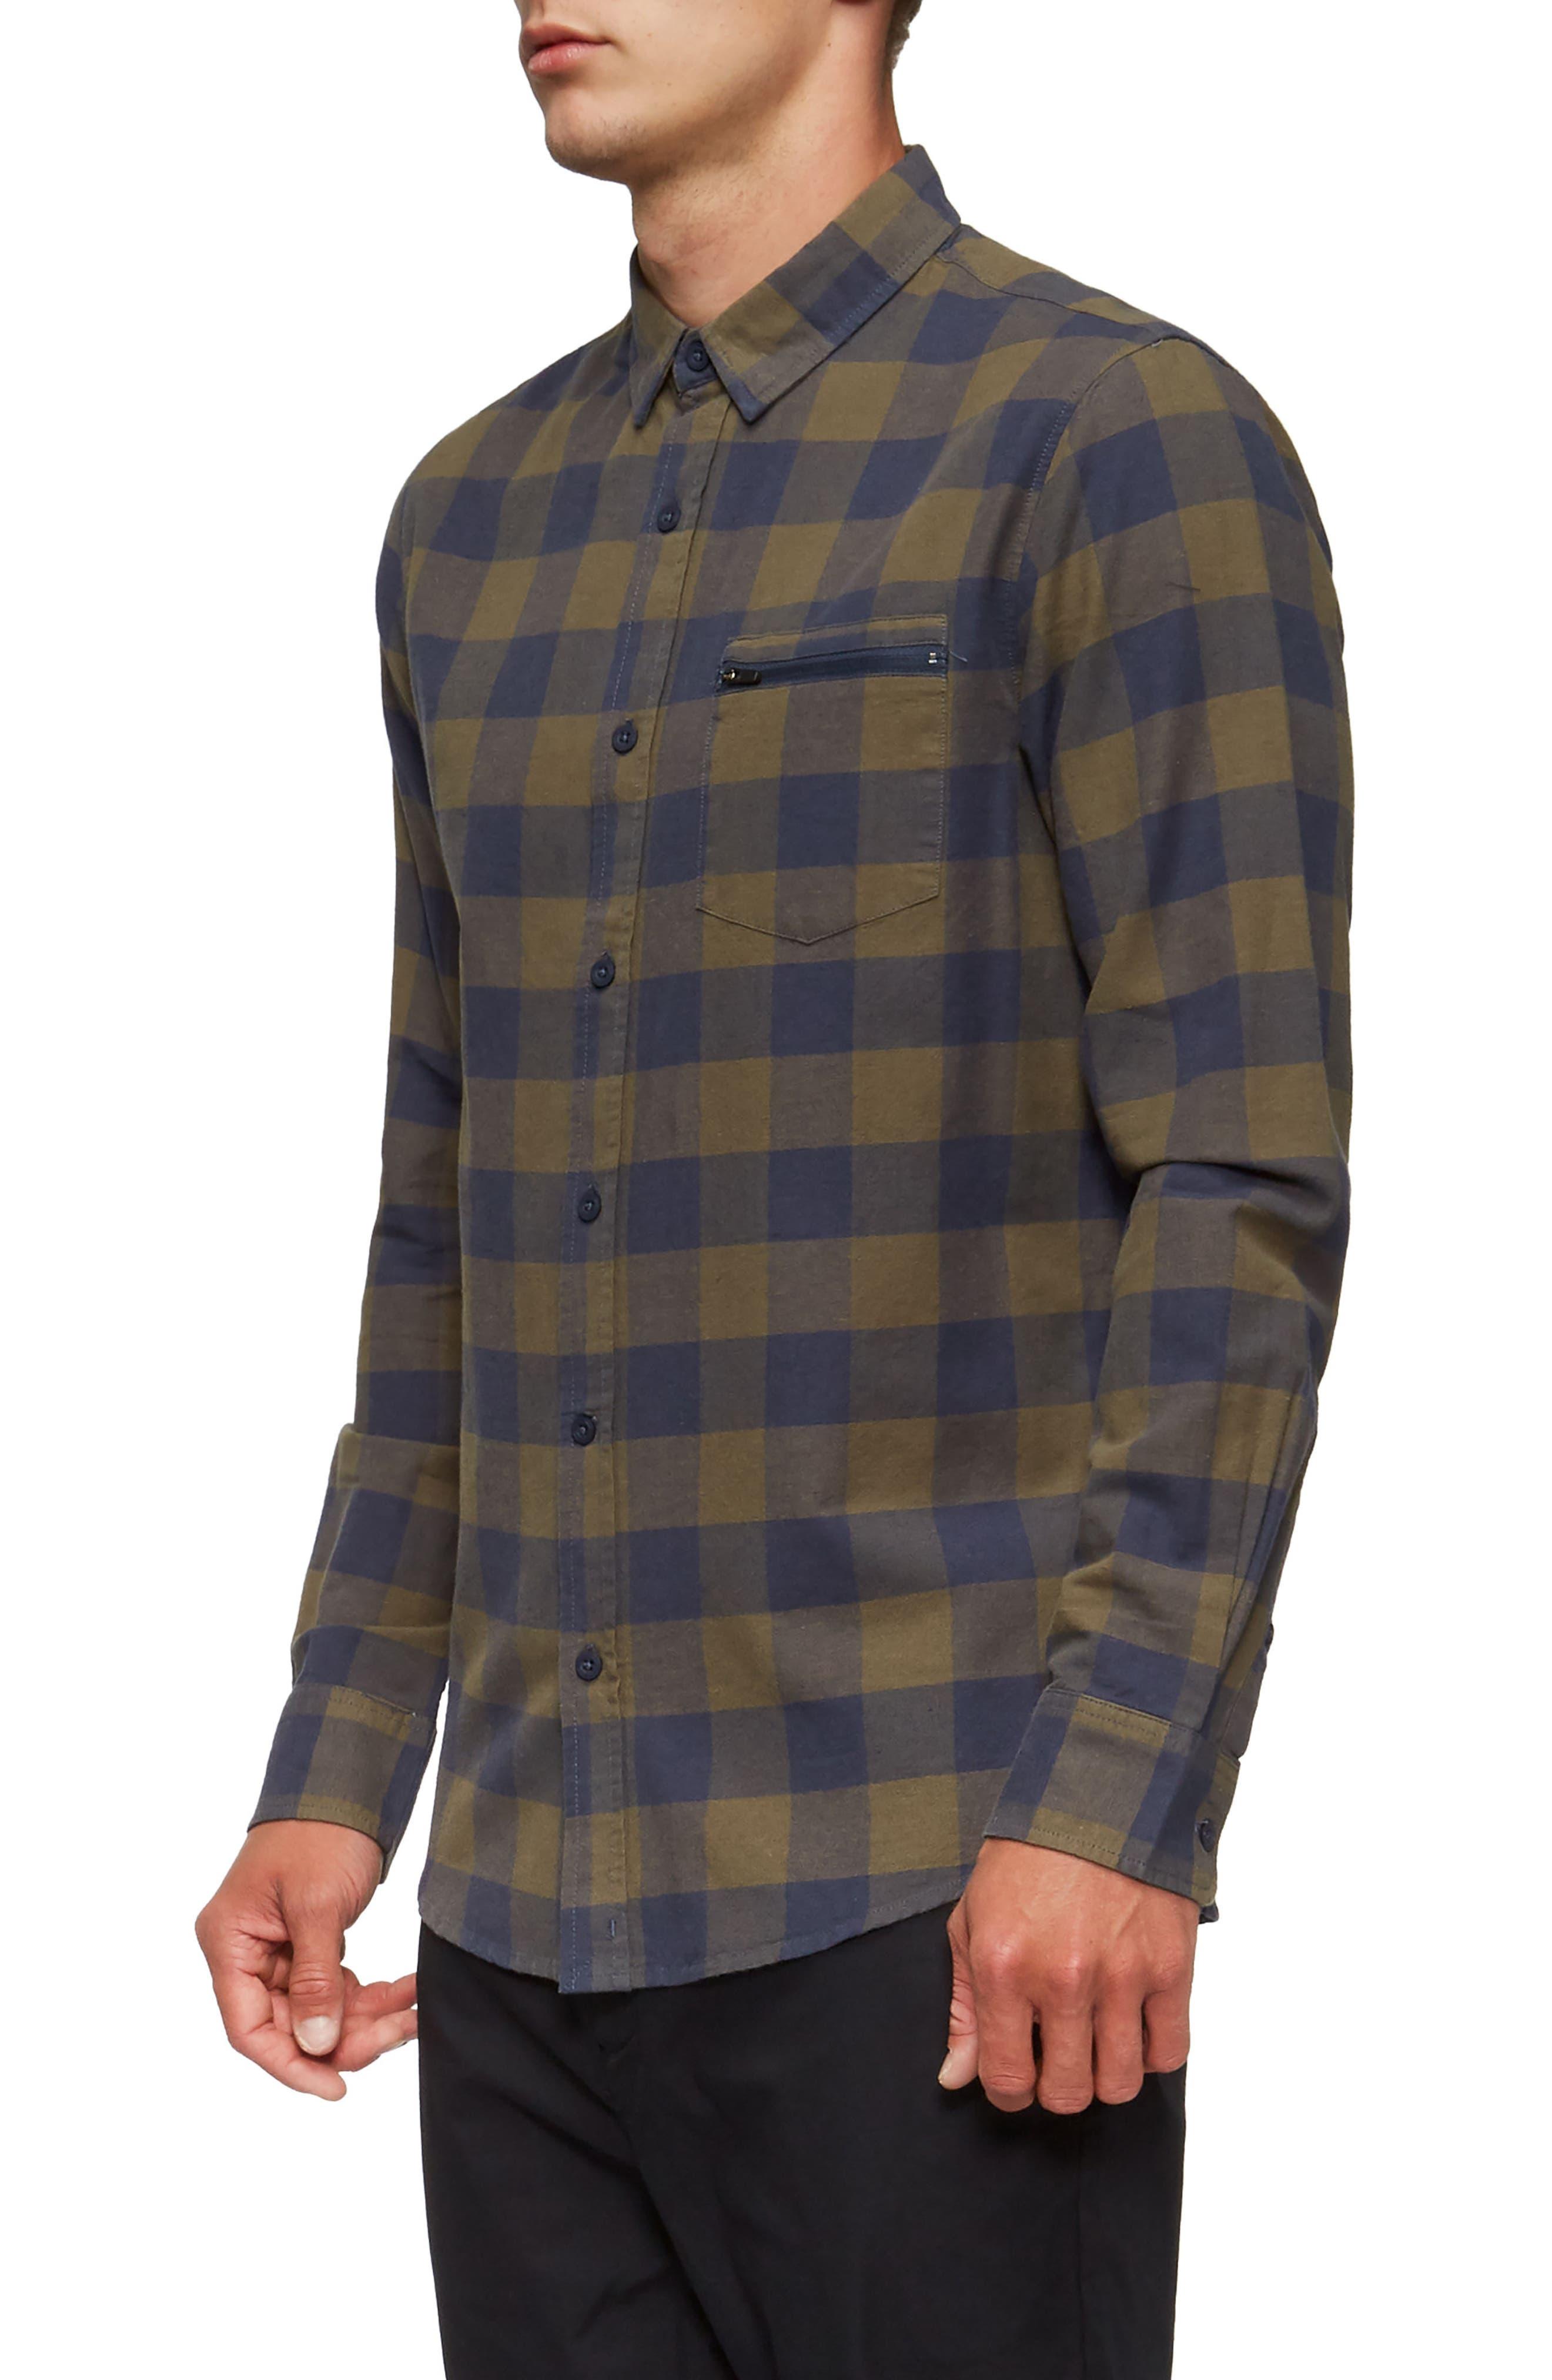 Cohen Long-Sleeve Shirt,                             Alternate thumbnail 3, color,                             Shadow Blue/ Olive